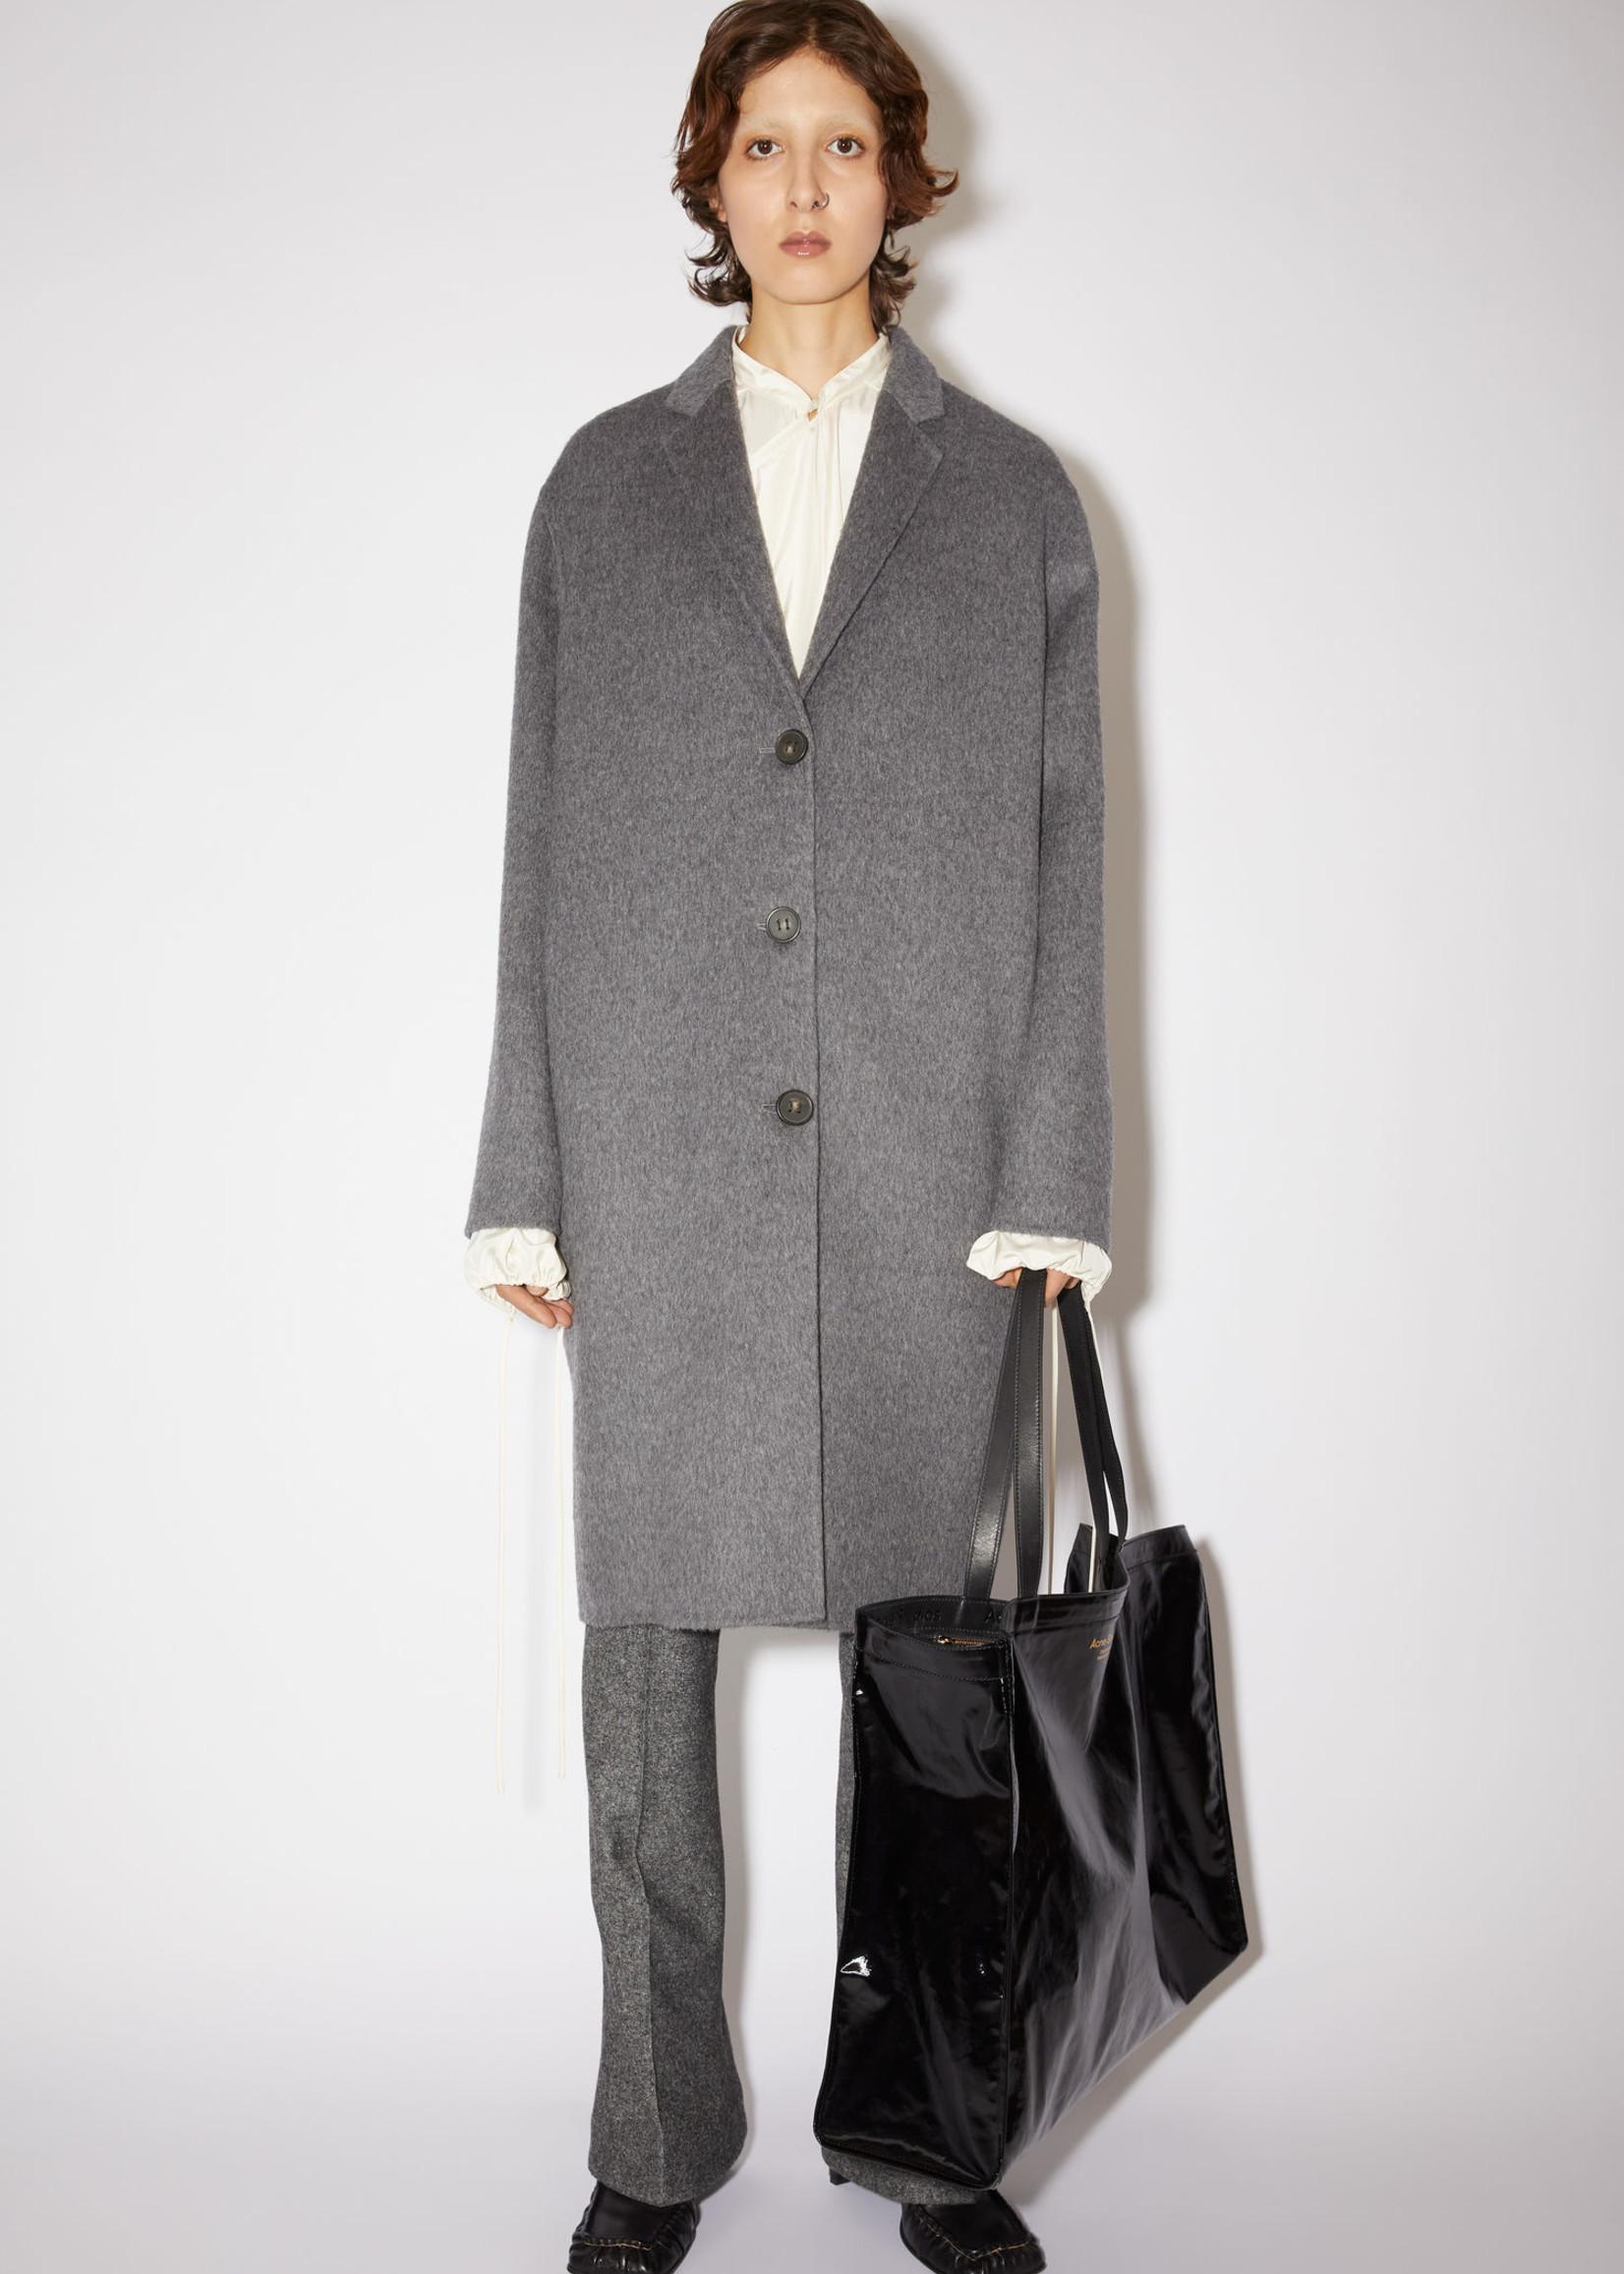 Acnestudios Acnestudios wool coat grey melange 36